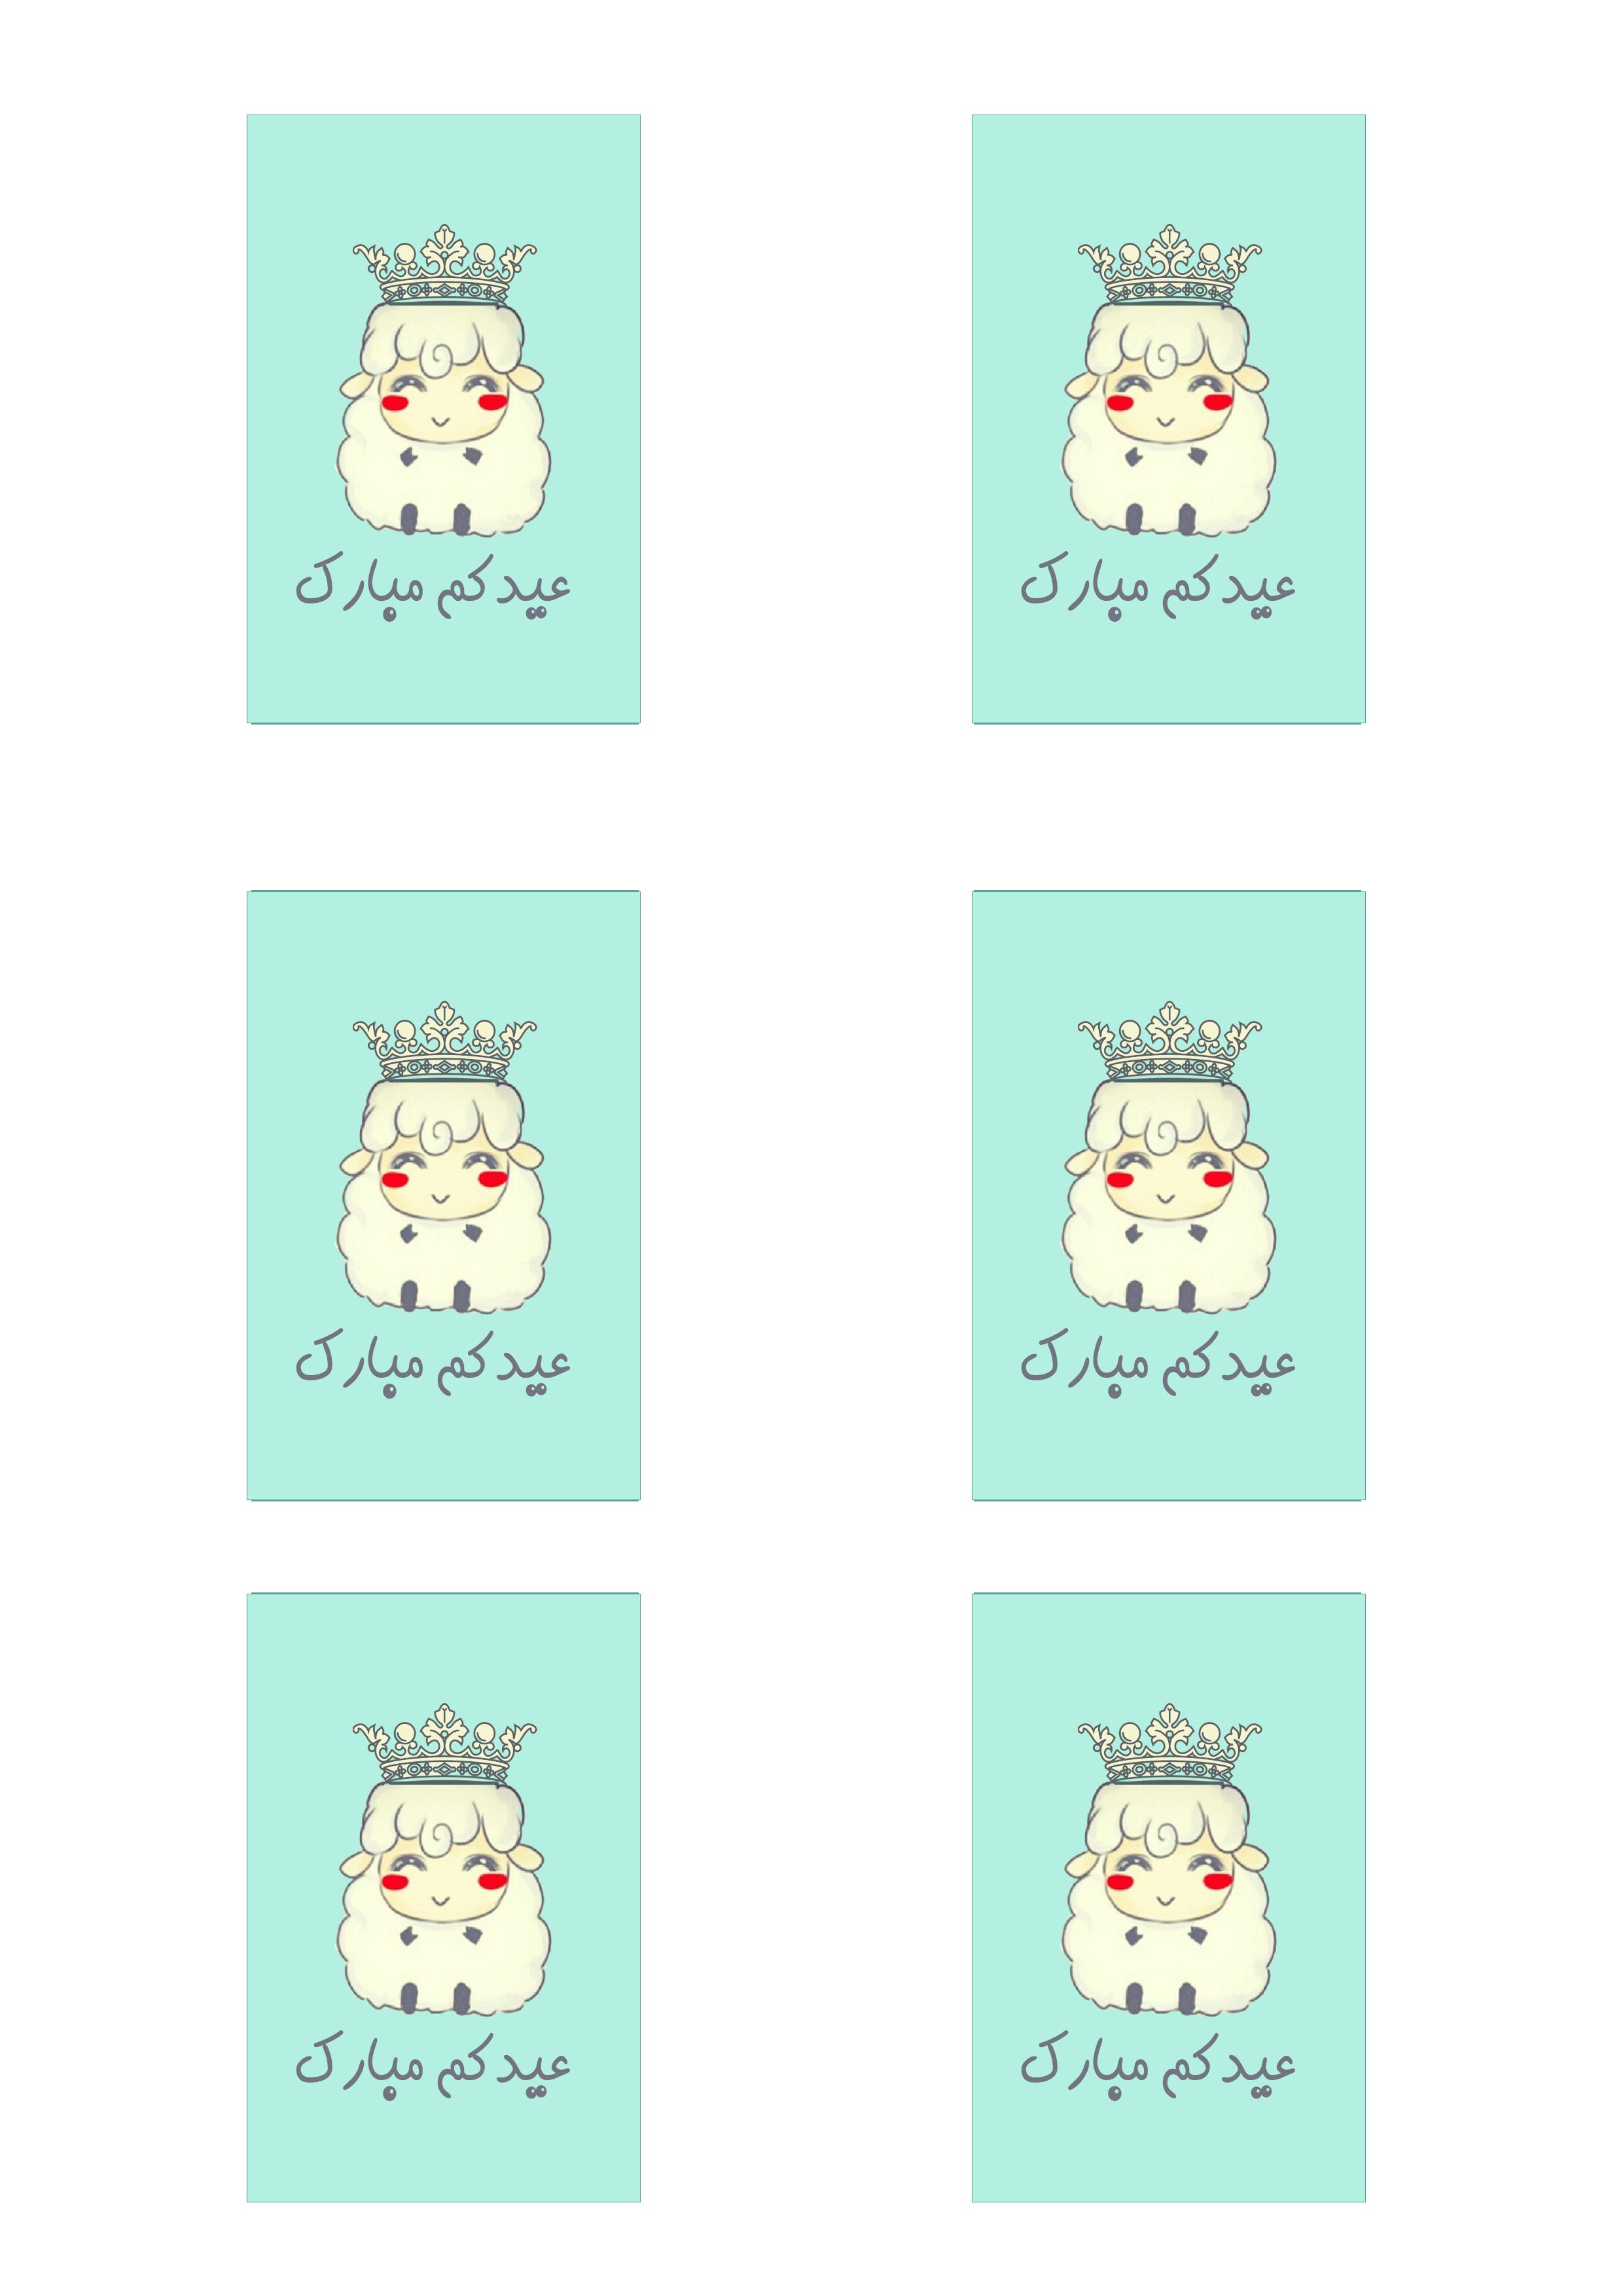 Http Store2 Up 00 Com 2015 09 144292183231 Png Eid Stickers Eid Mubarak Stickers Eid Crafts